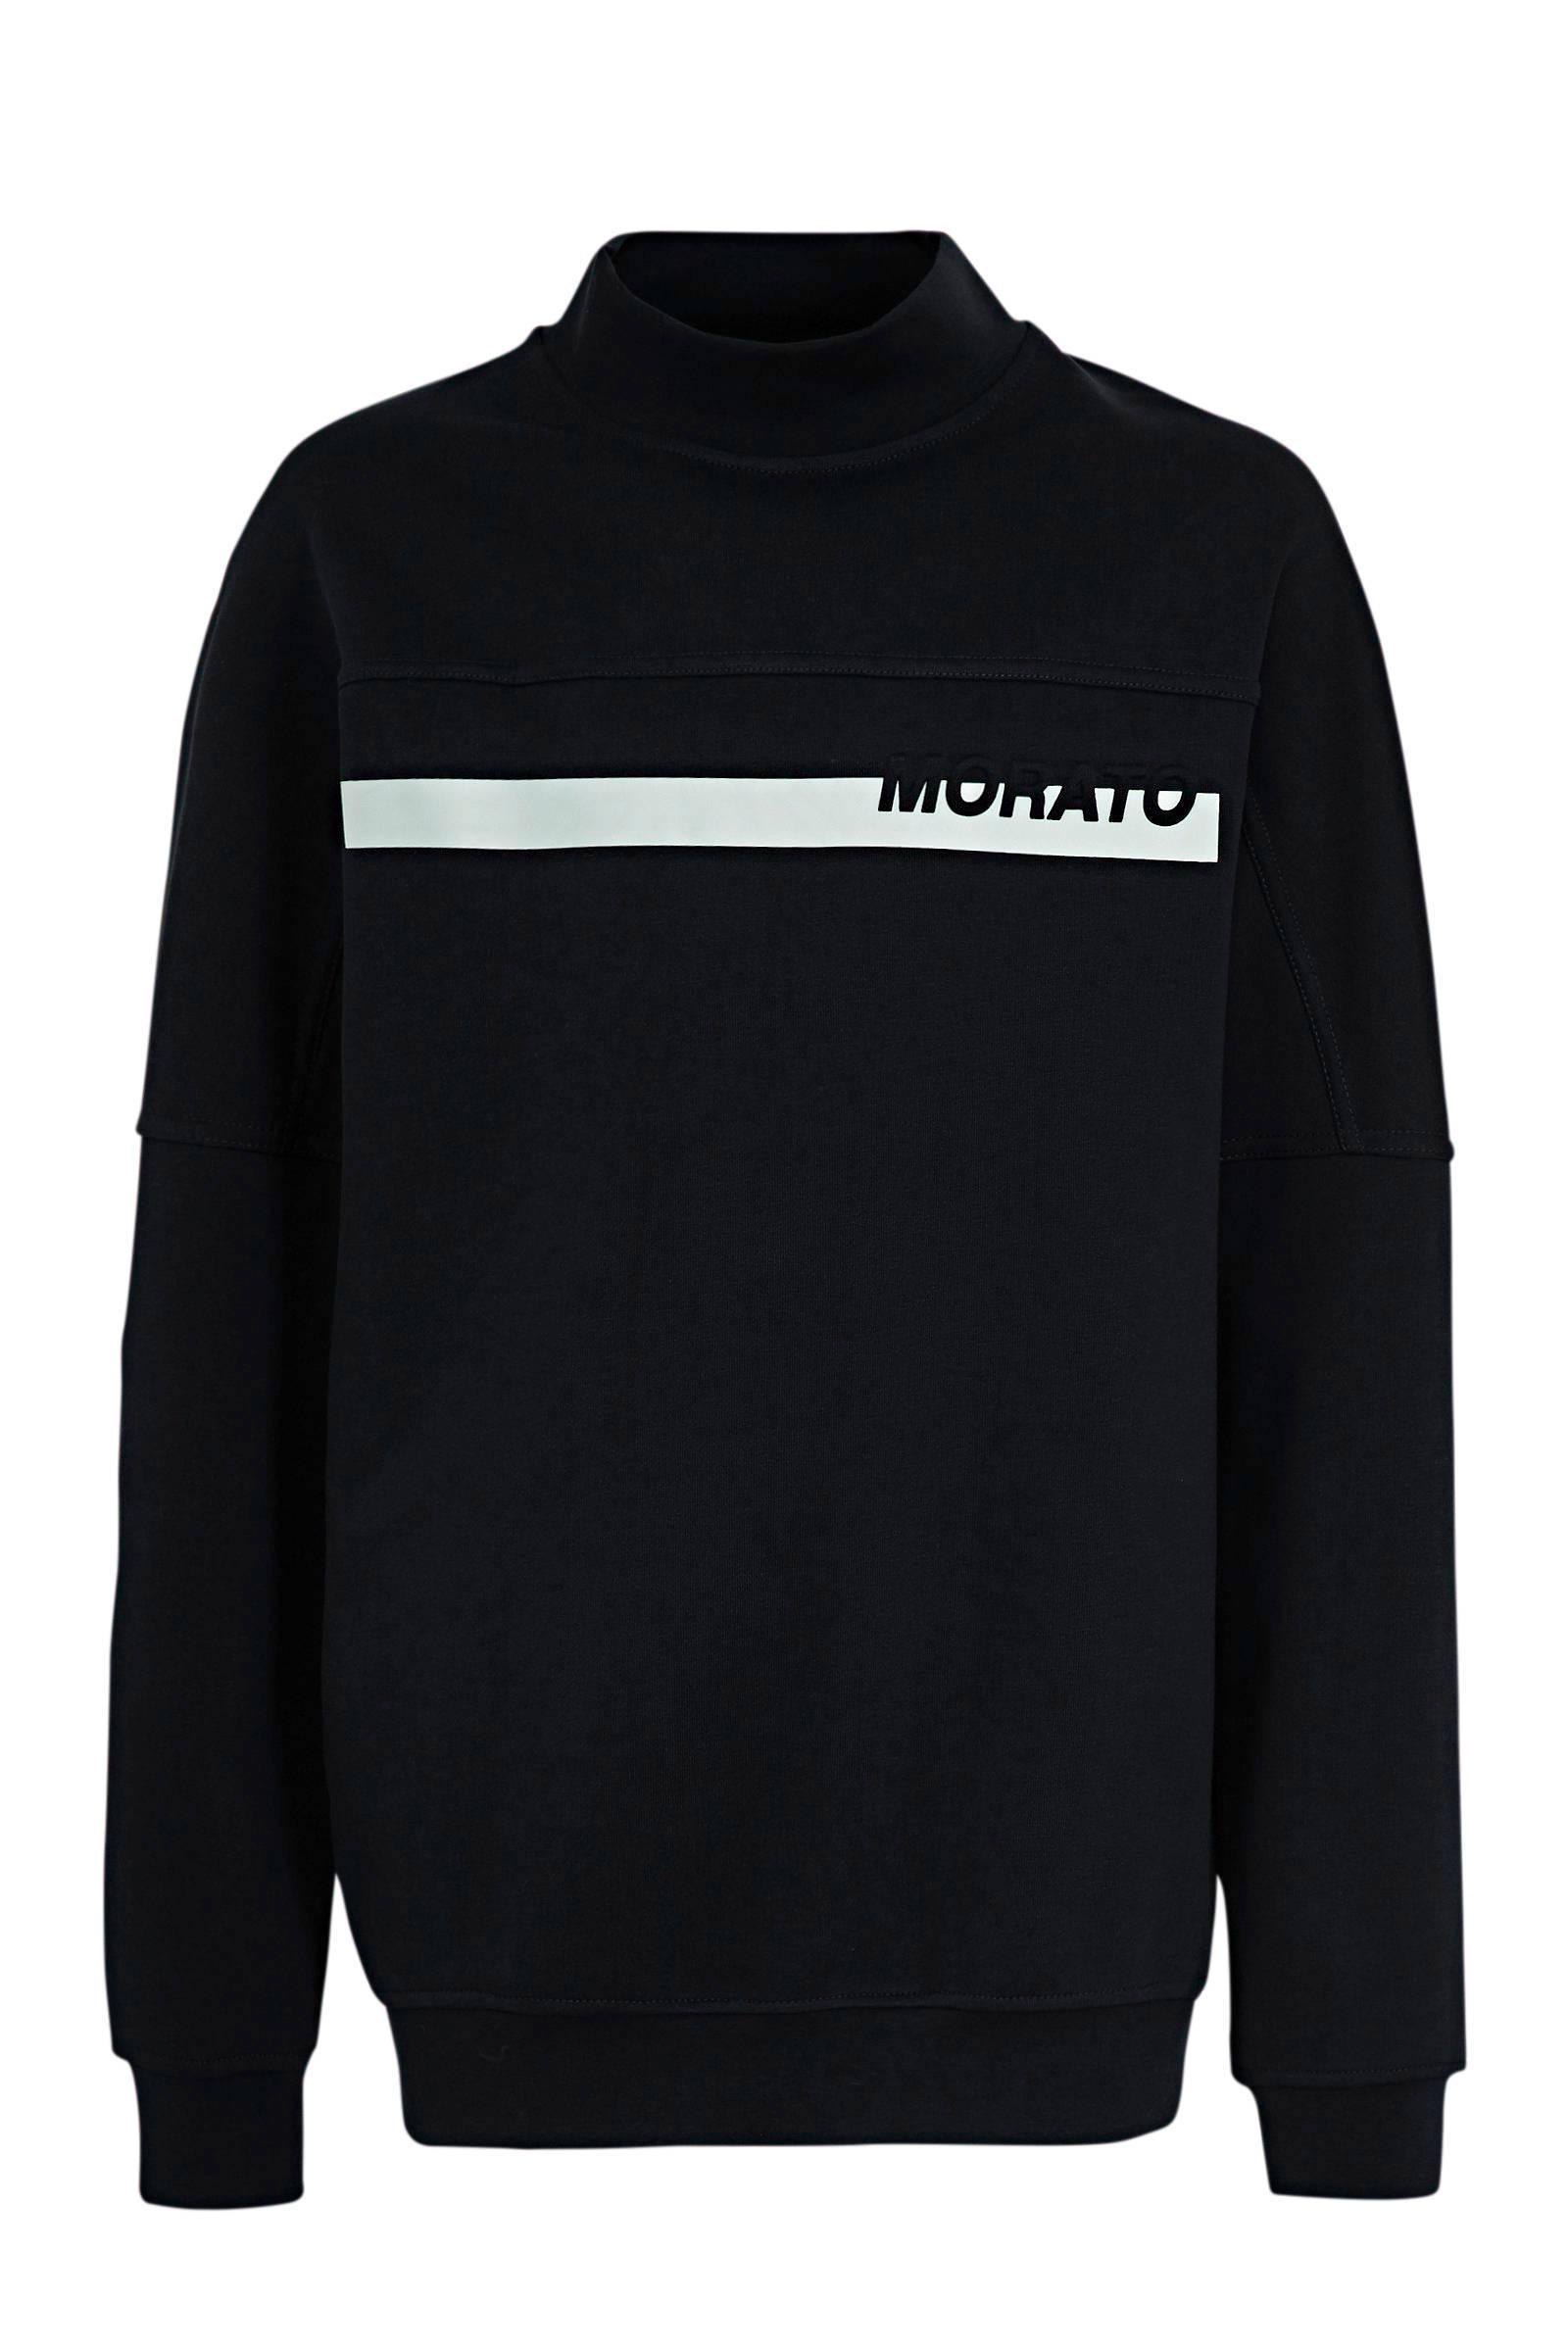 Antony Morato sweater met printopdruk donkerblauw | wehkamp